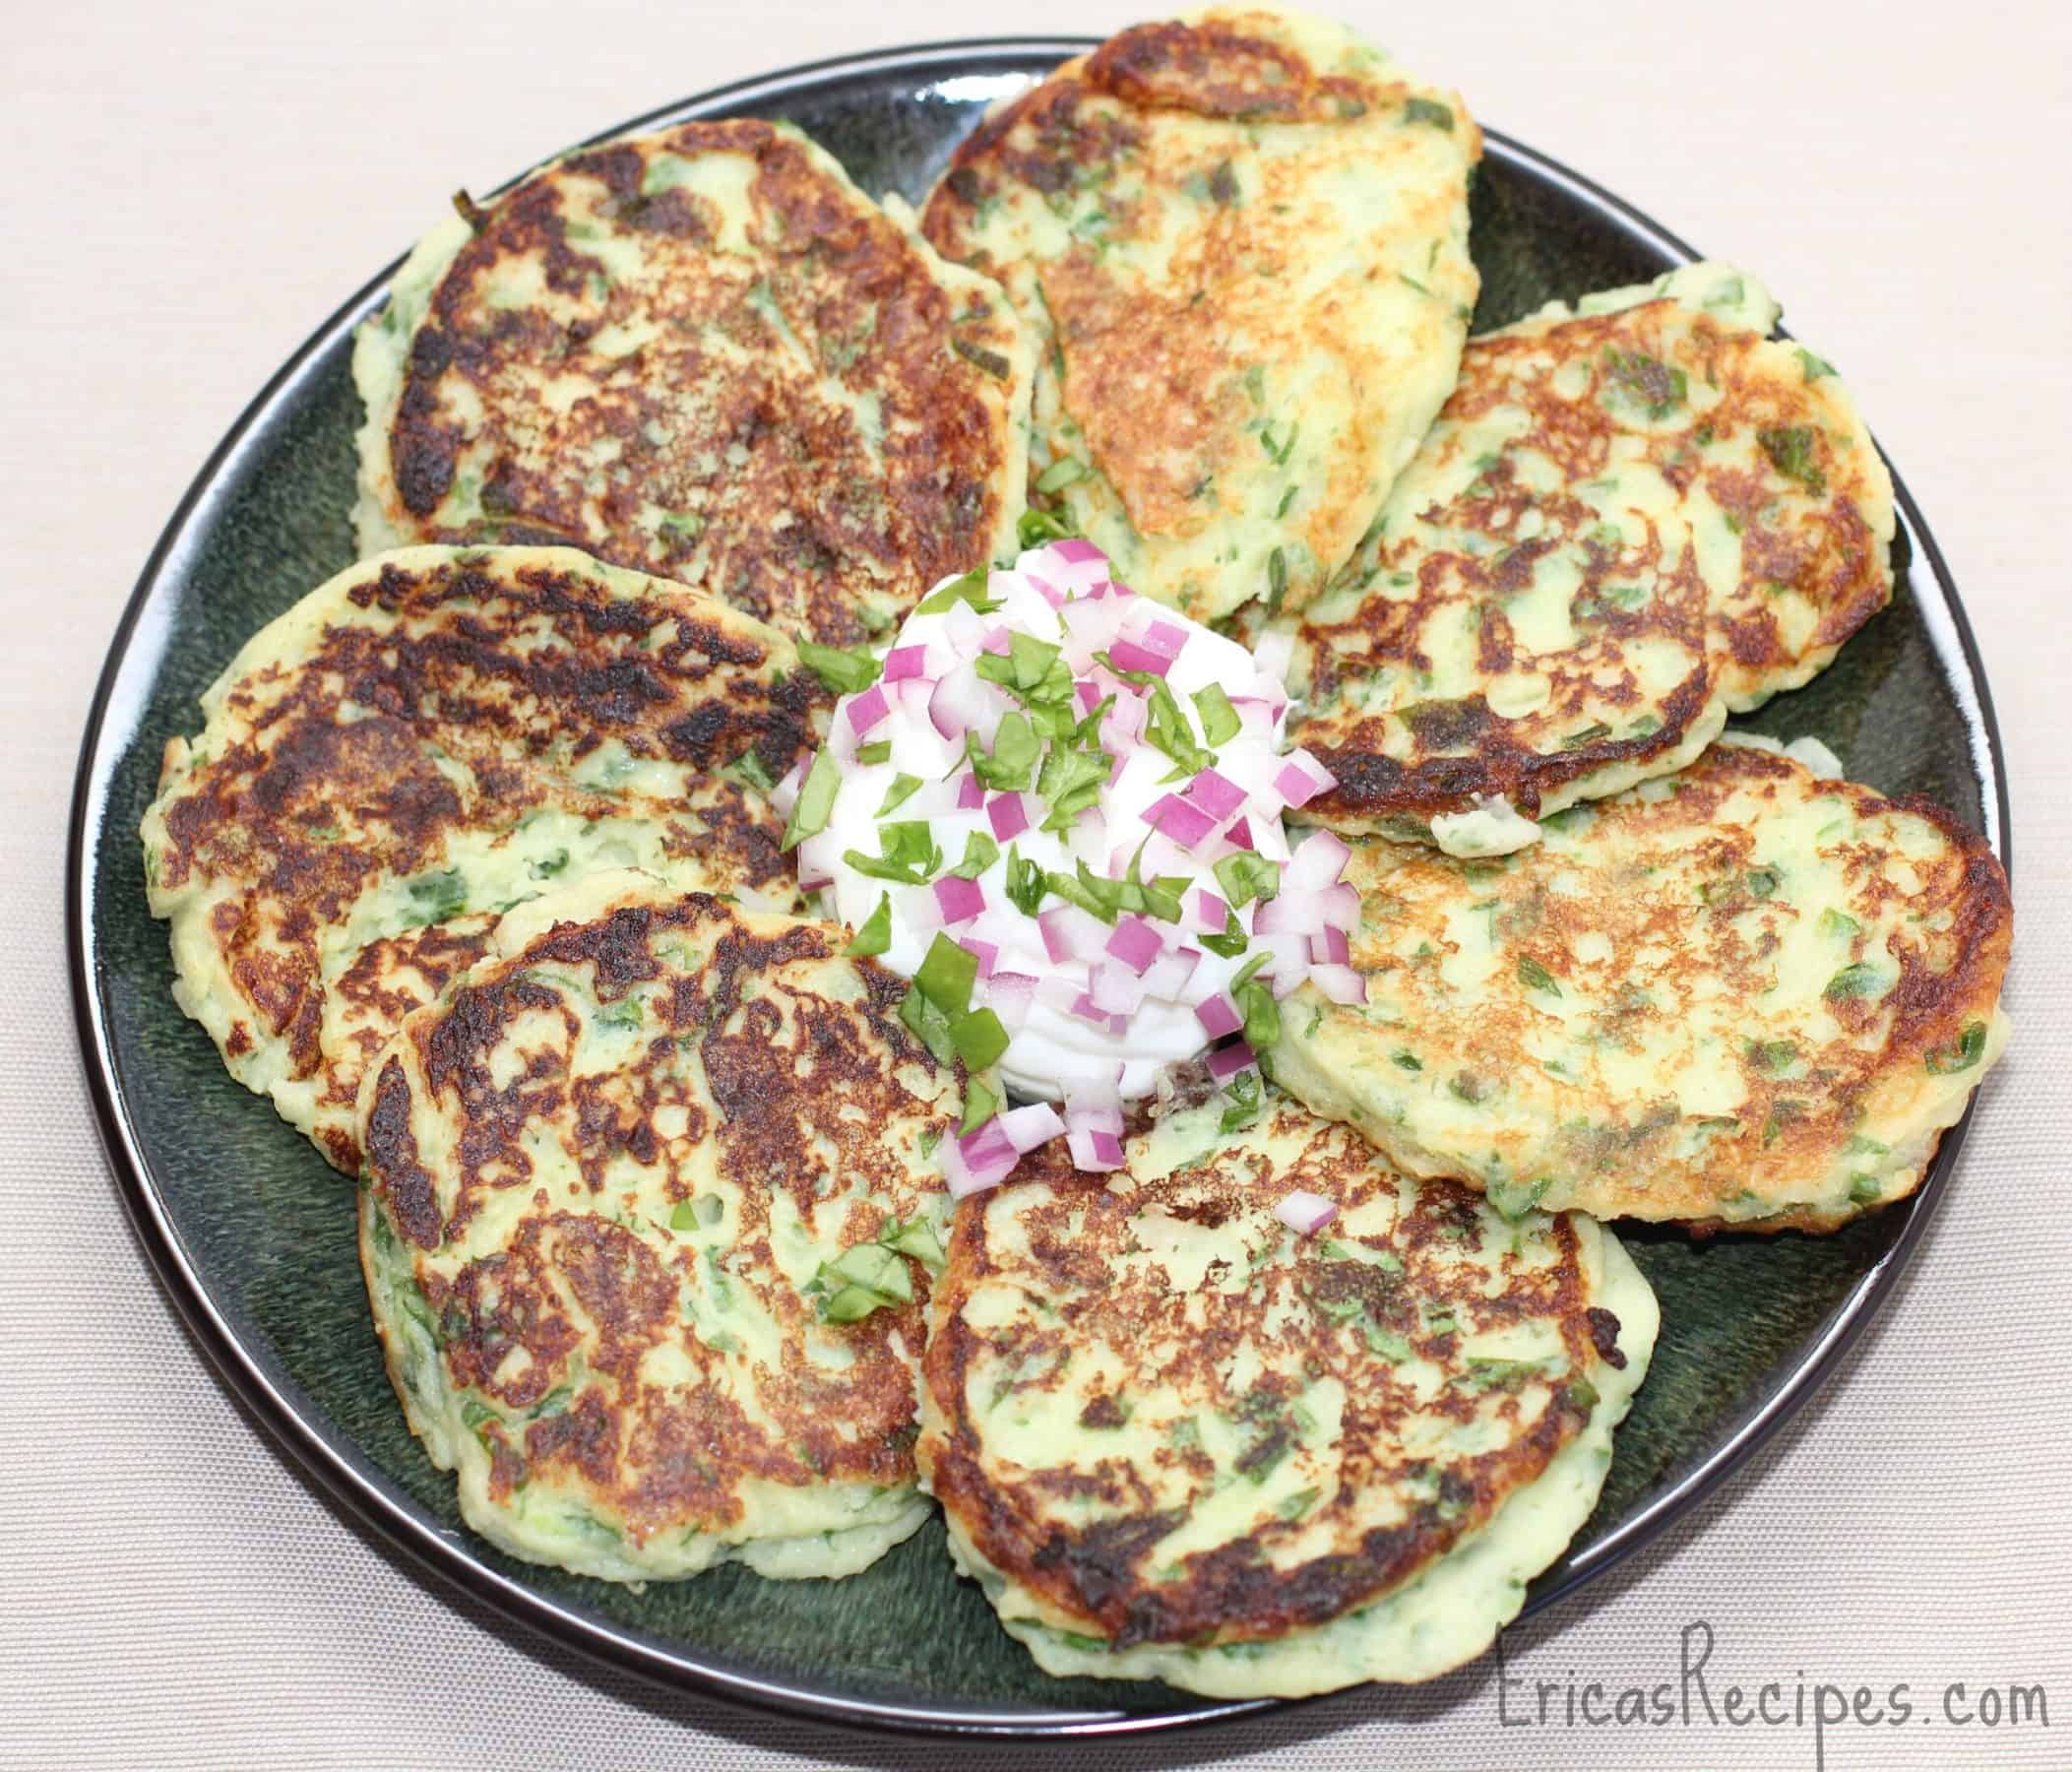 Garlicky Spinach-Potato Cakes